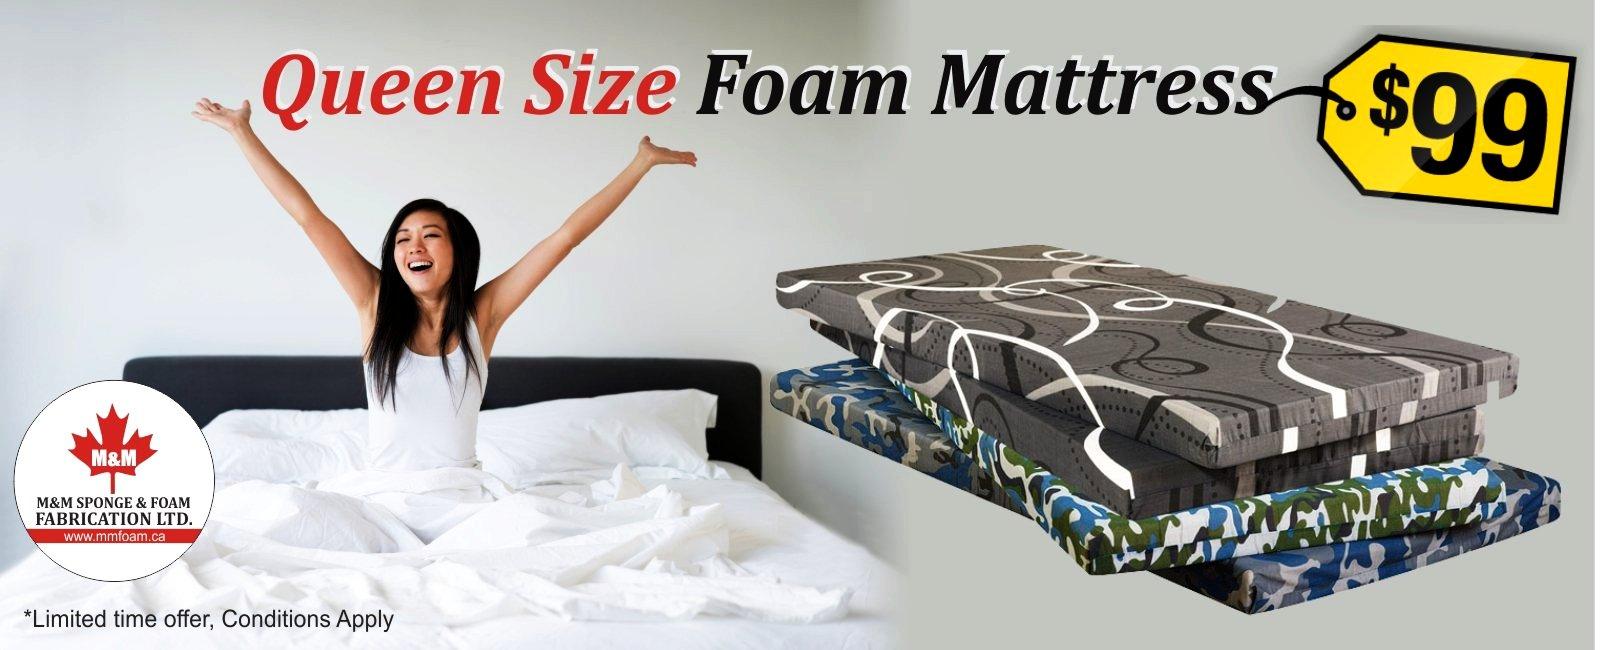 Canada150 Deal Queen Size Foam Sponge Mattress Just For 99 Mm